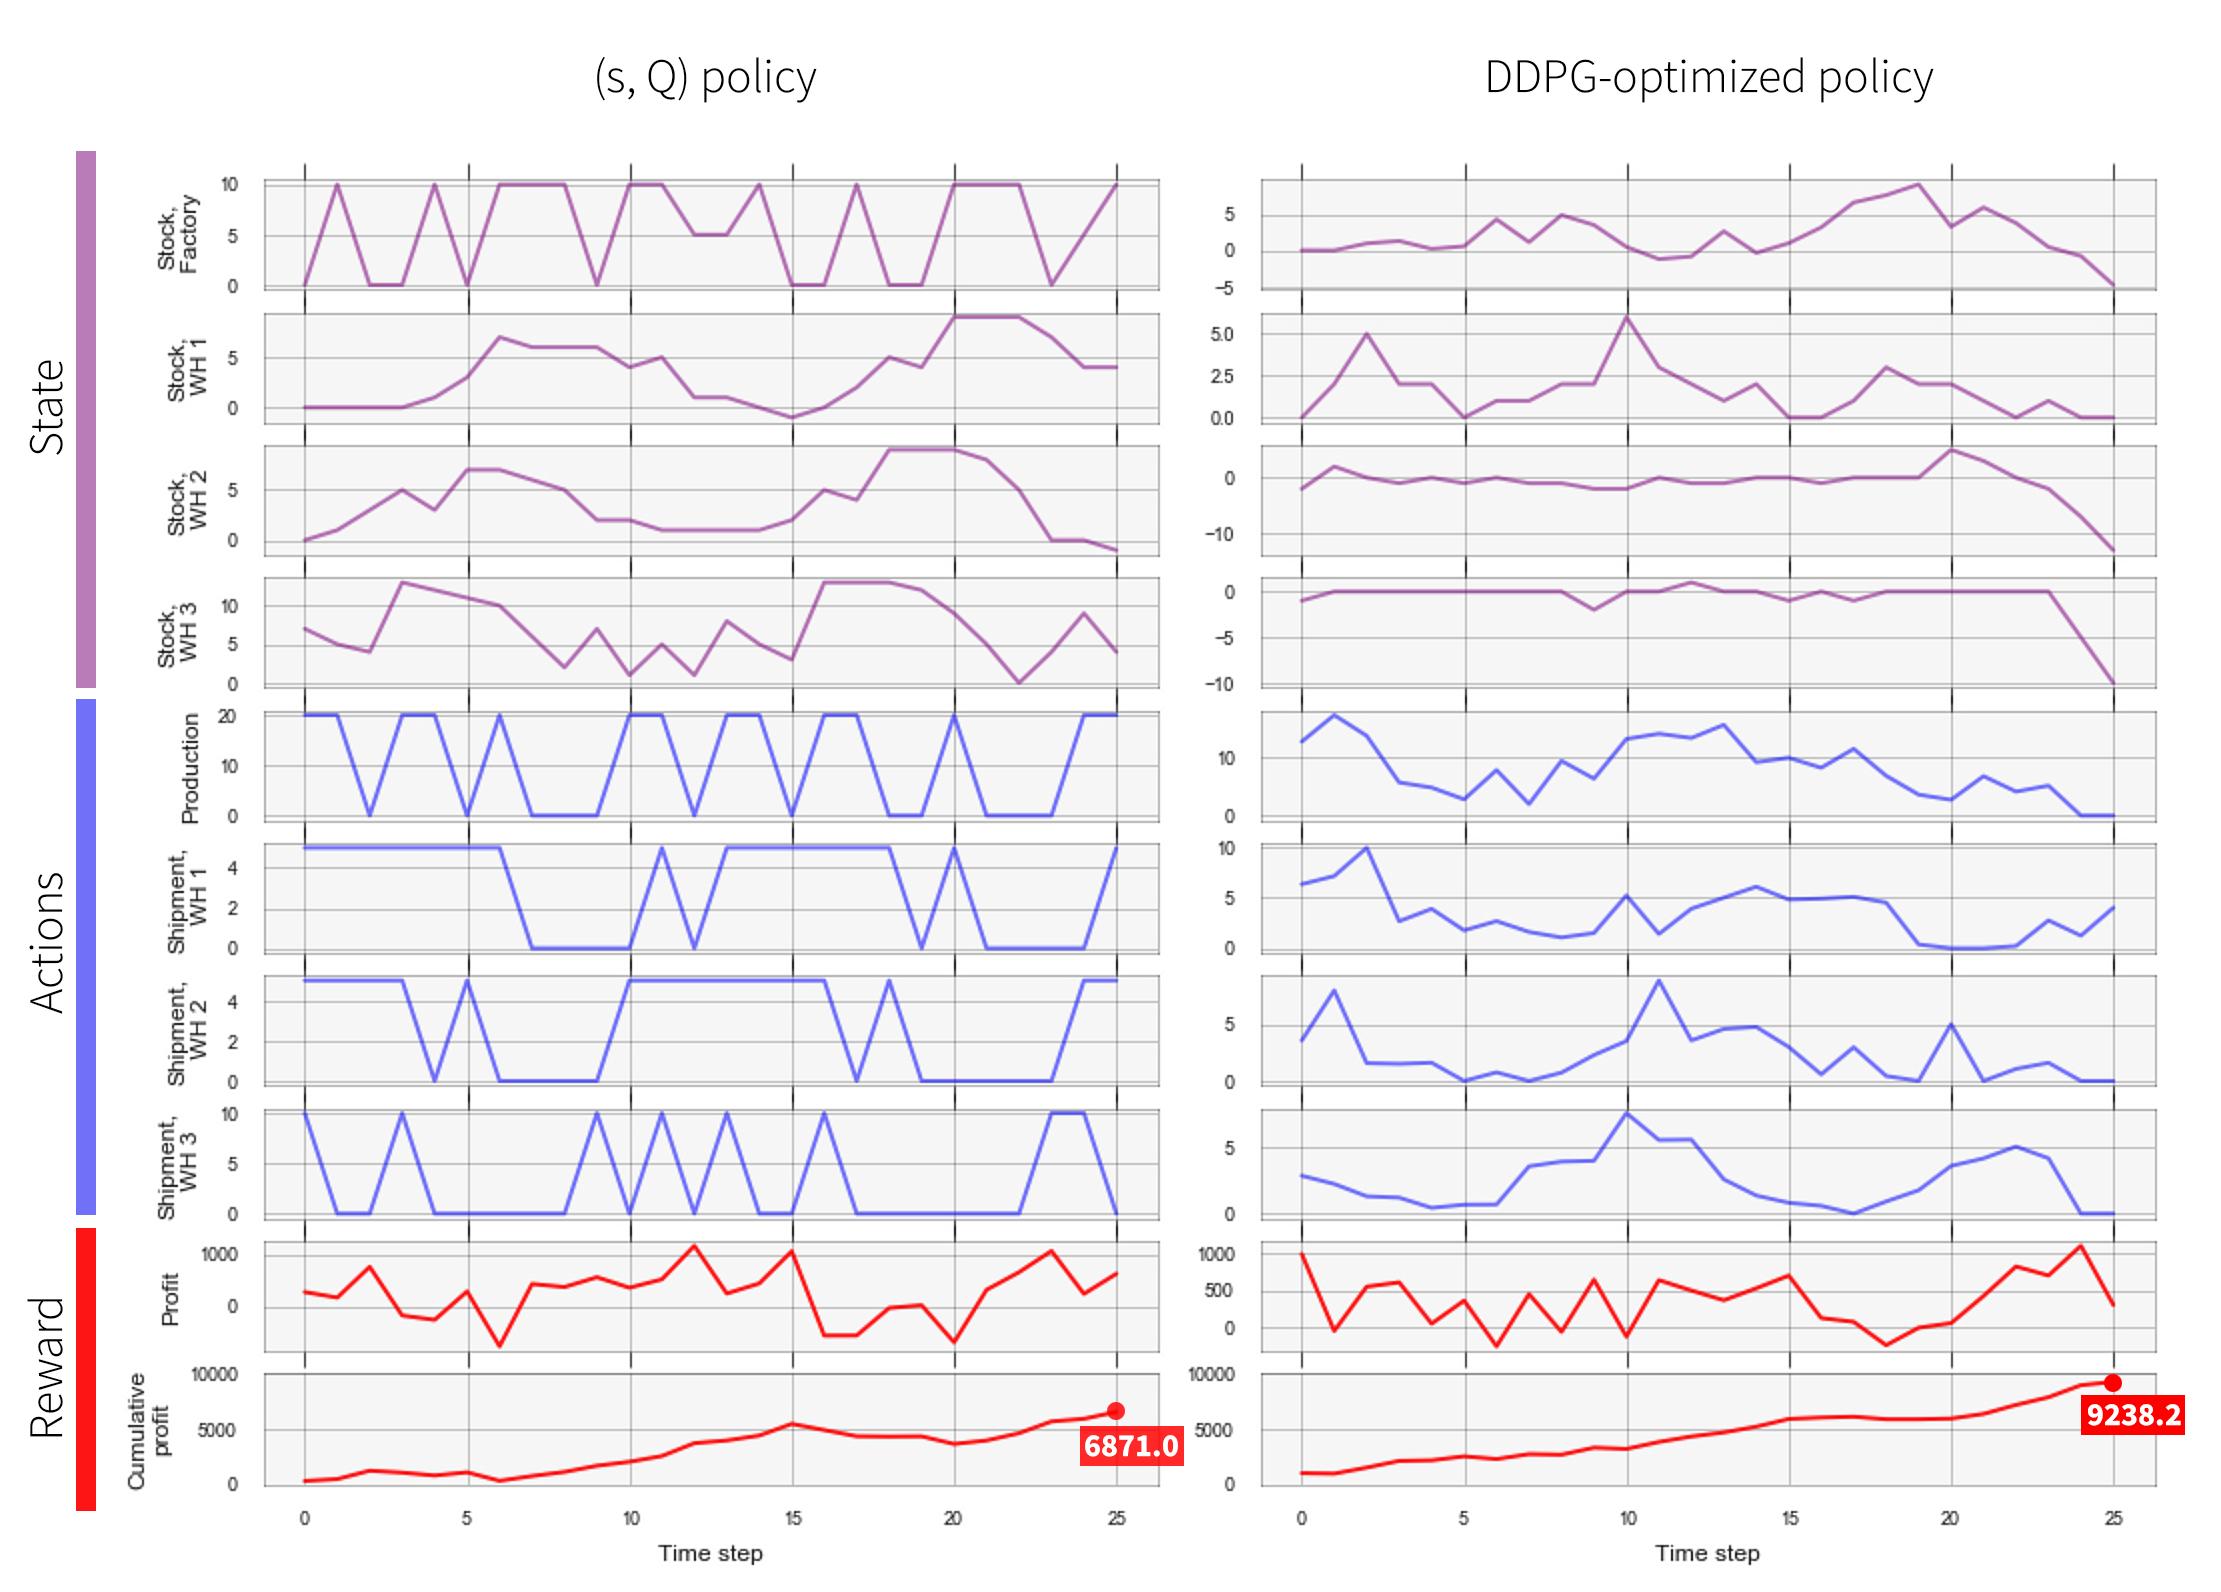 supply-chain-policy-trace-sQ-vs-DDPG